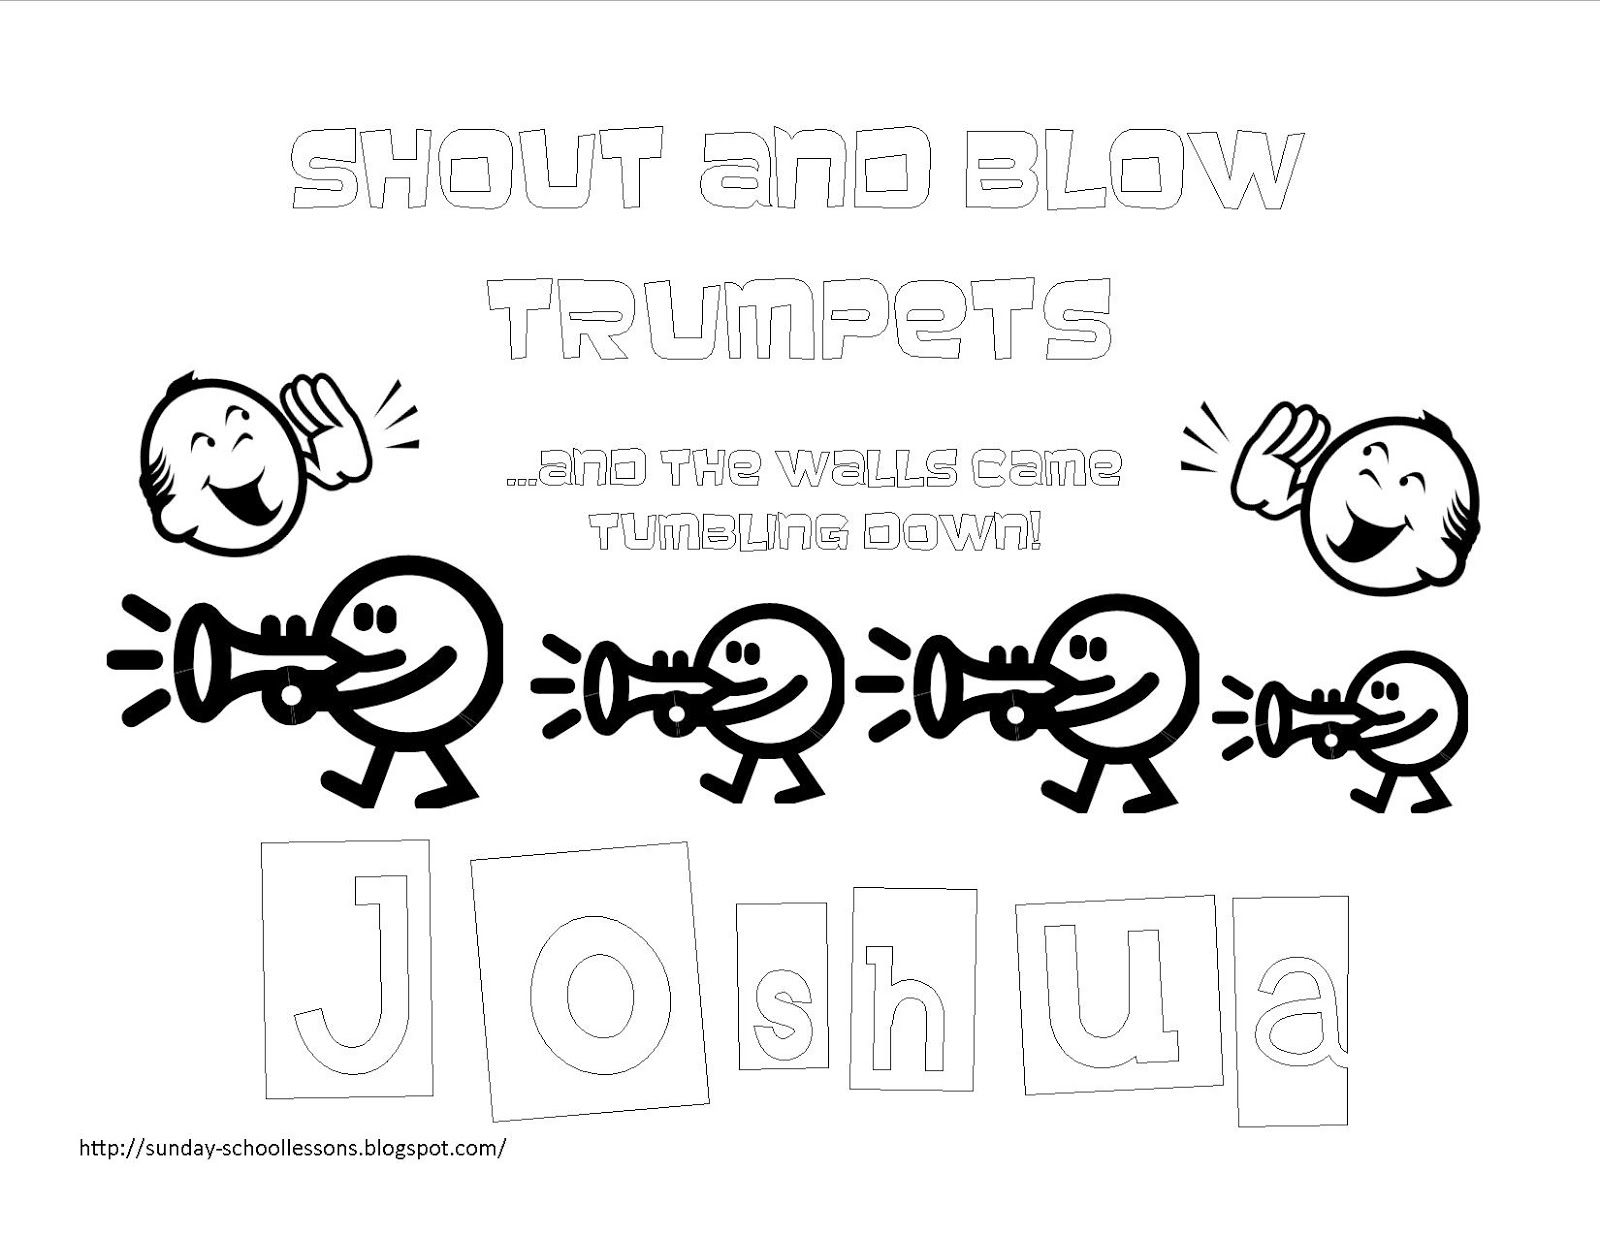 Joshua Fought The Battle Of Jericho Coloring Page Book Of Joshua Free Coloring Pages For Kids Sunday School